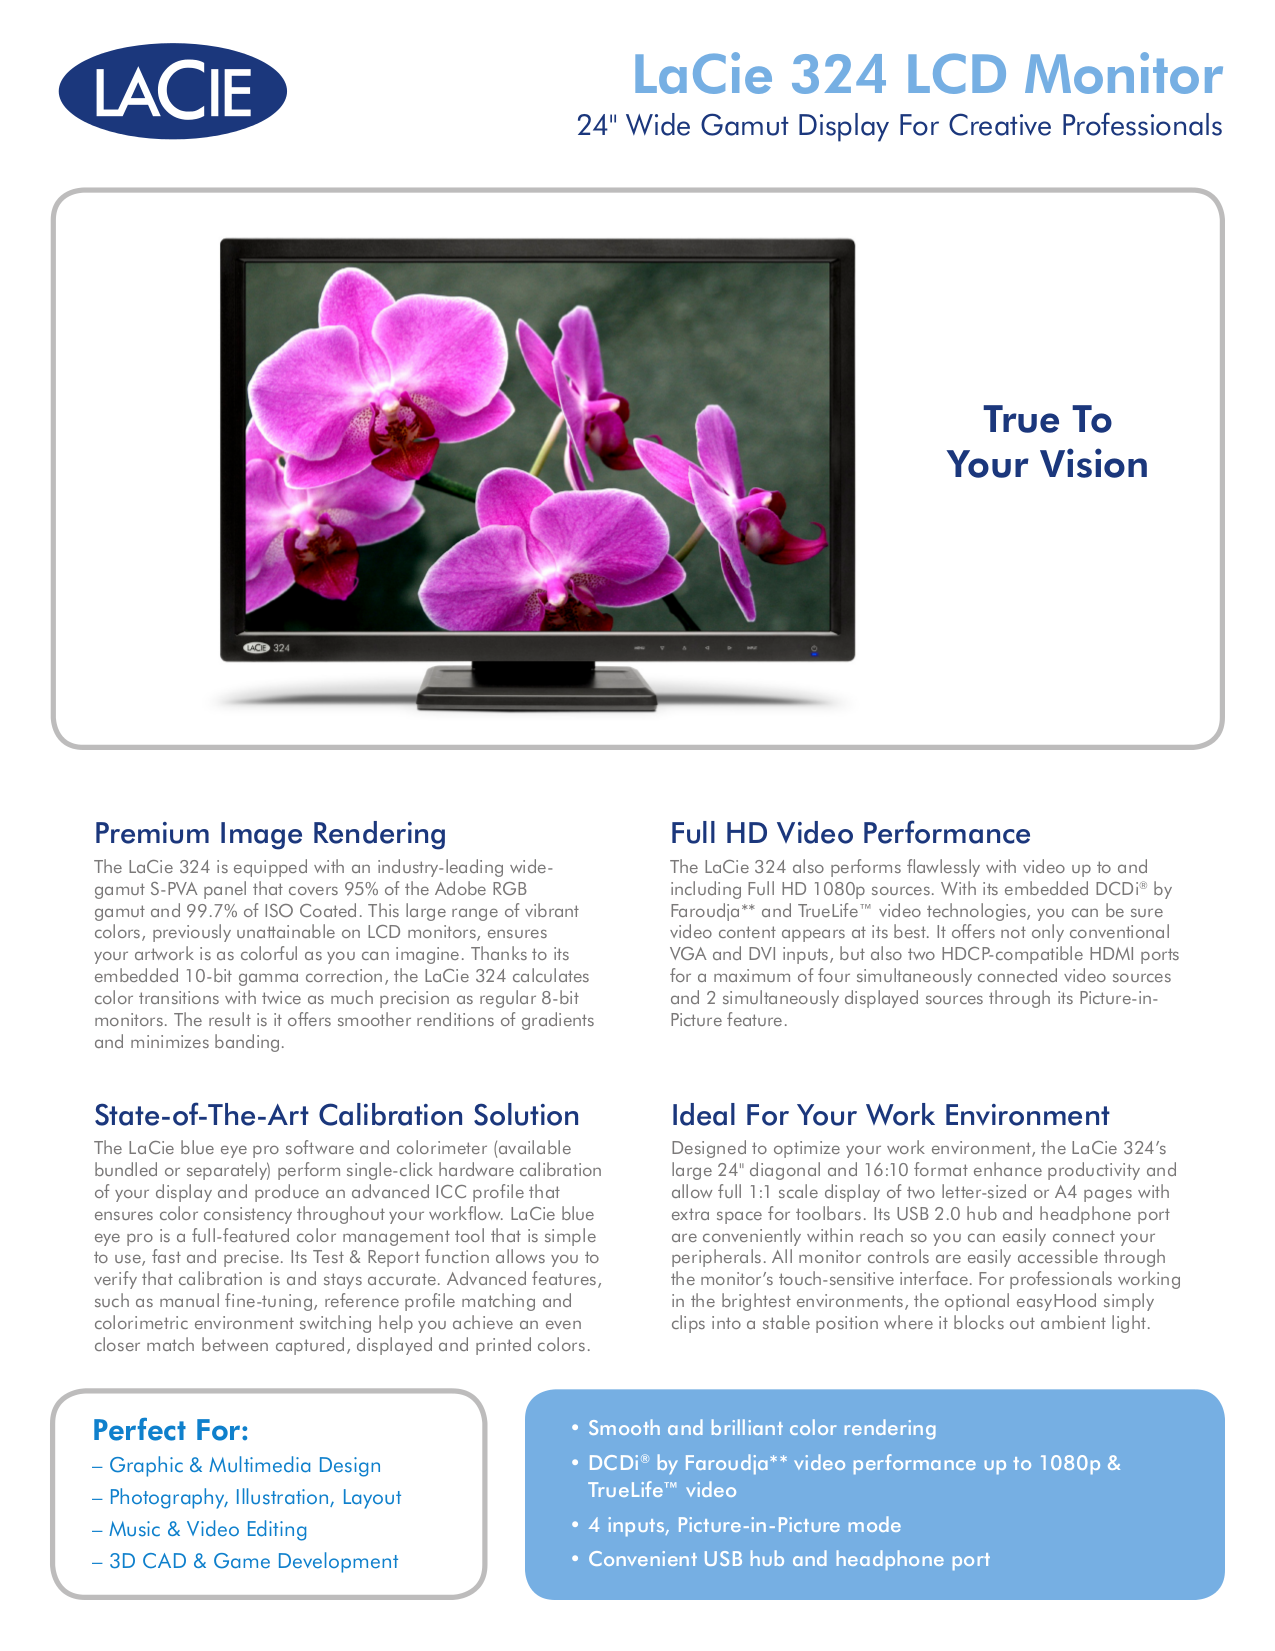 pdf for LaCie Monitor 324 manual